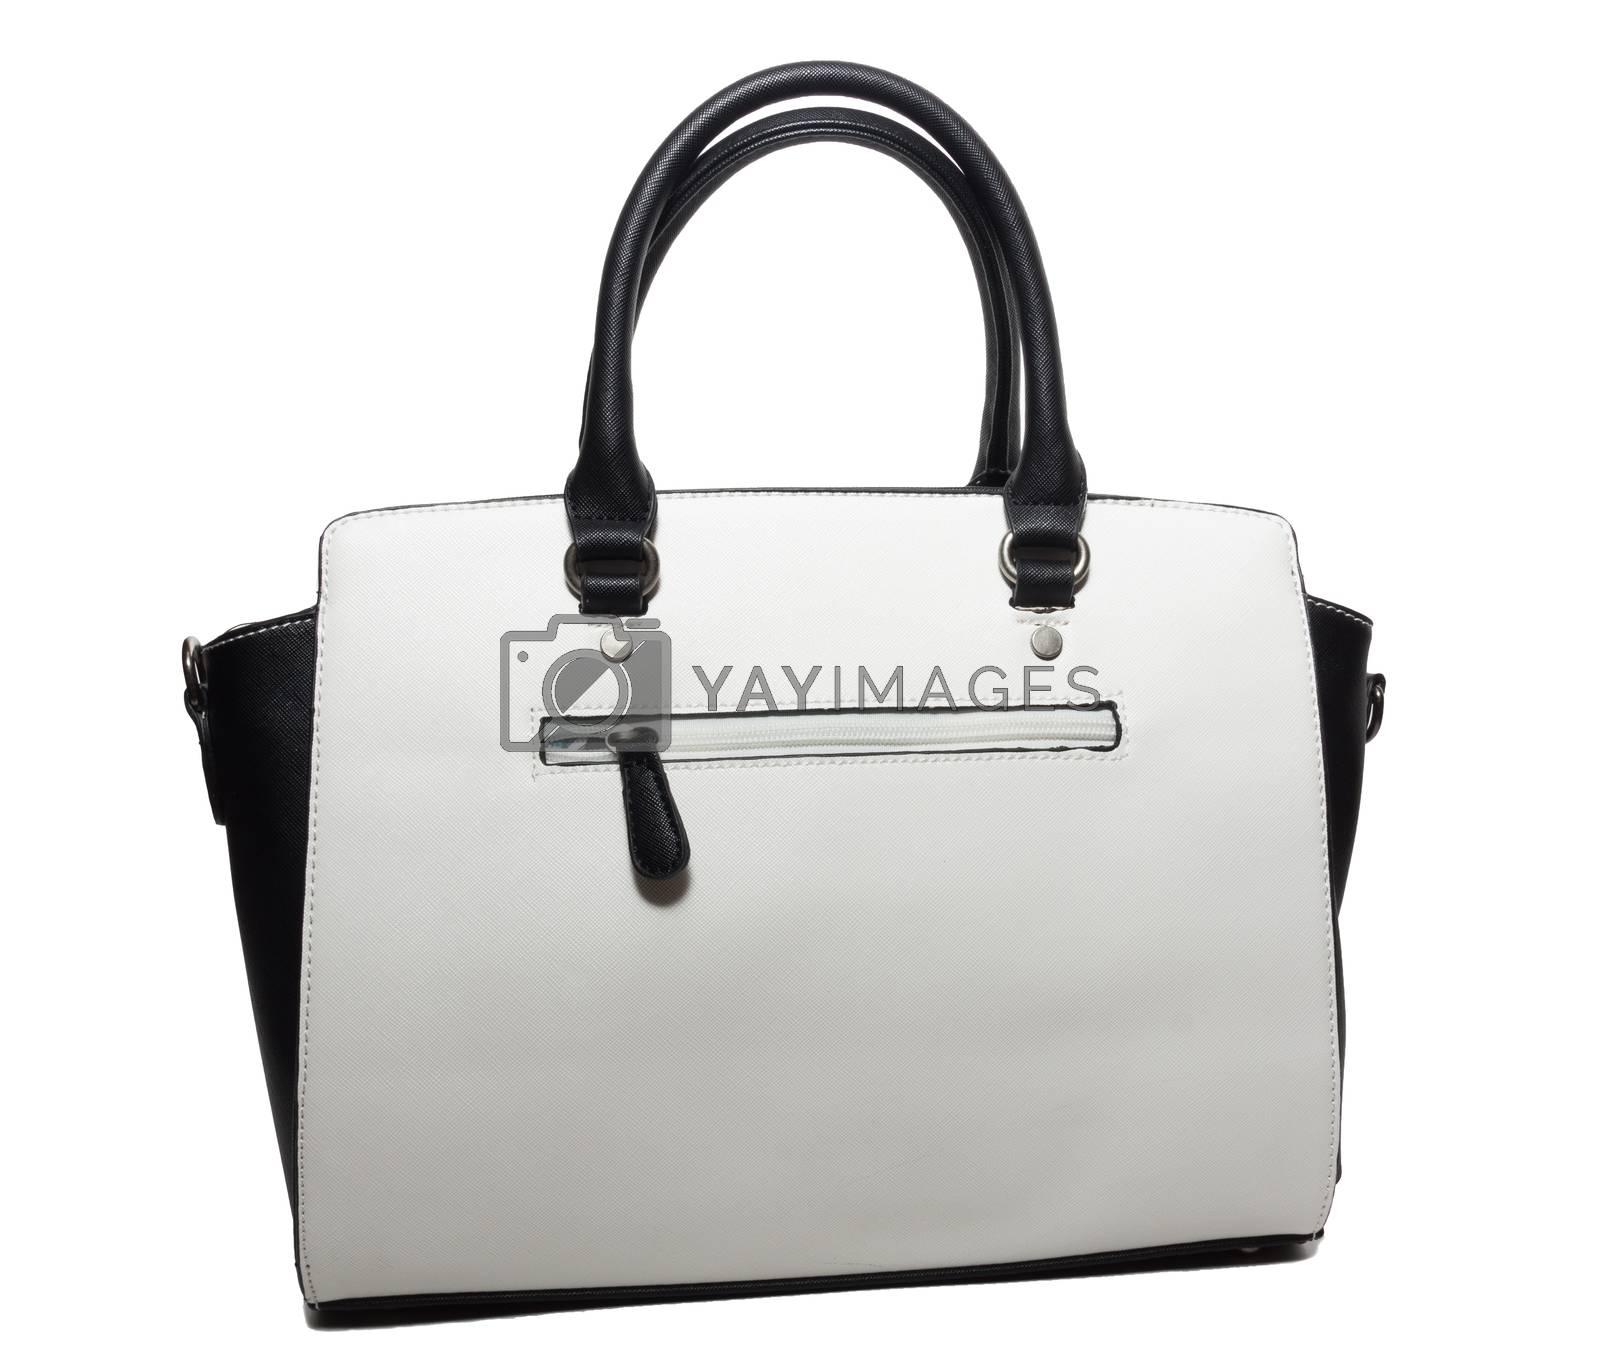 Royalty free image of female handbag on a white background by AlexBush